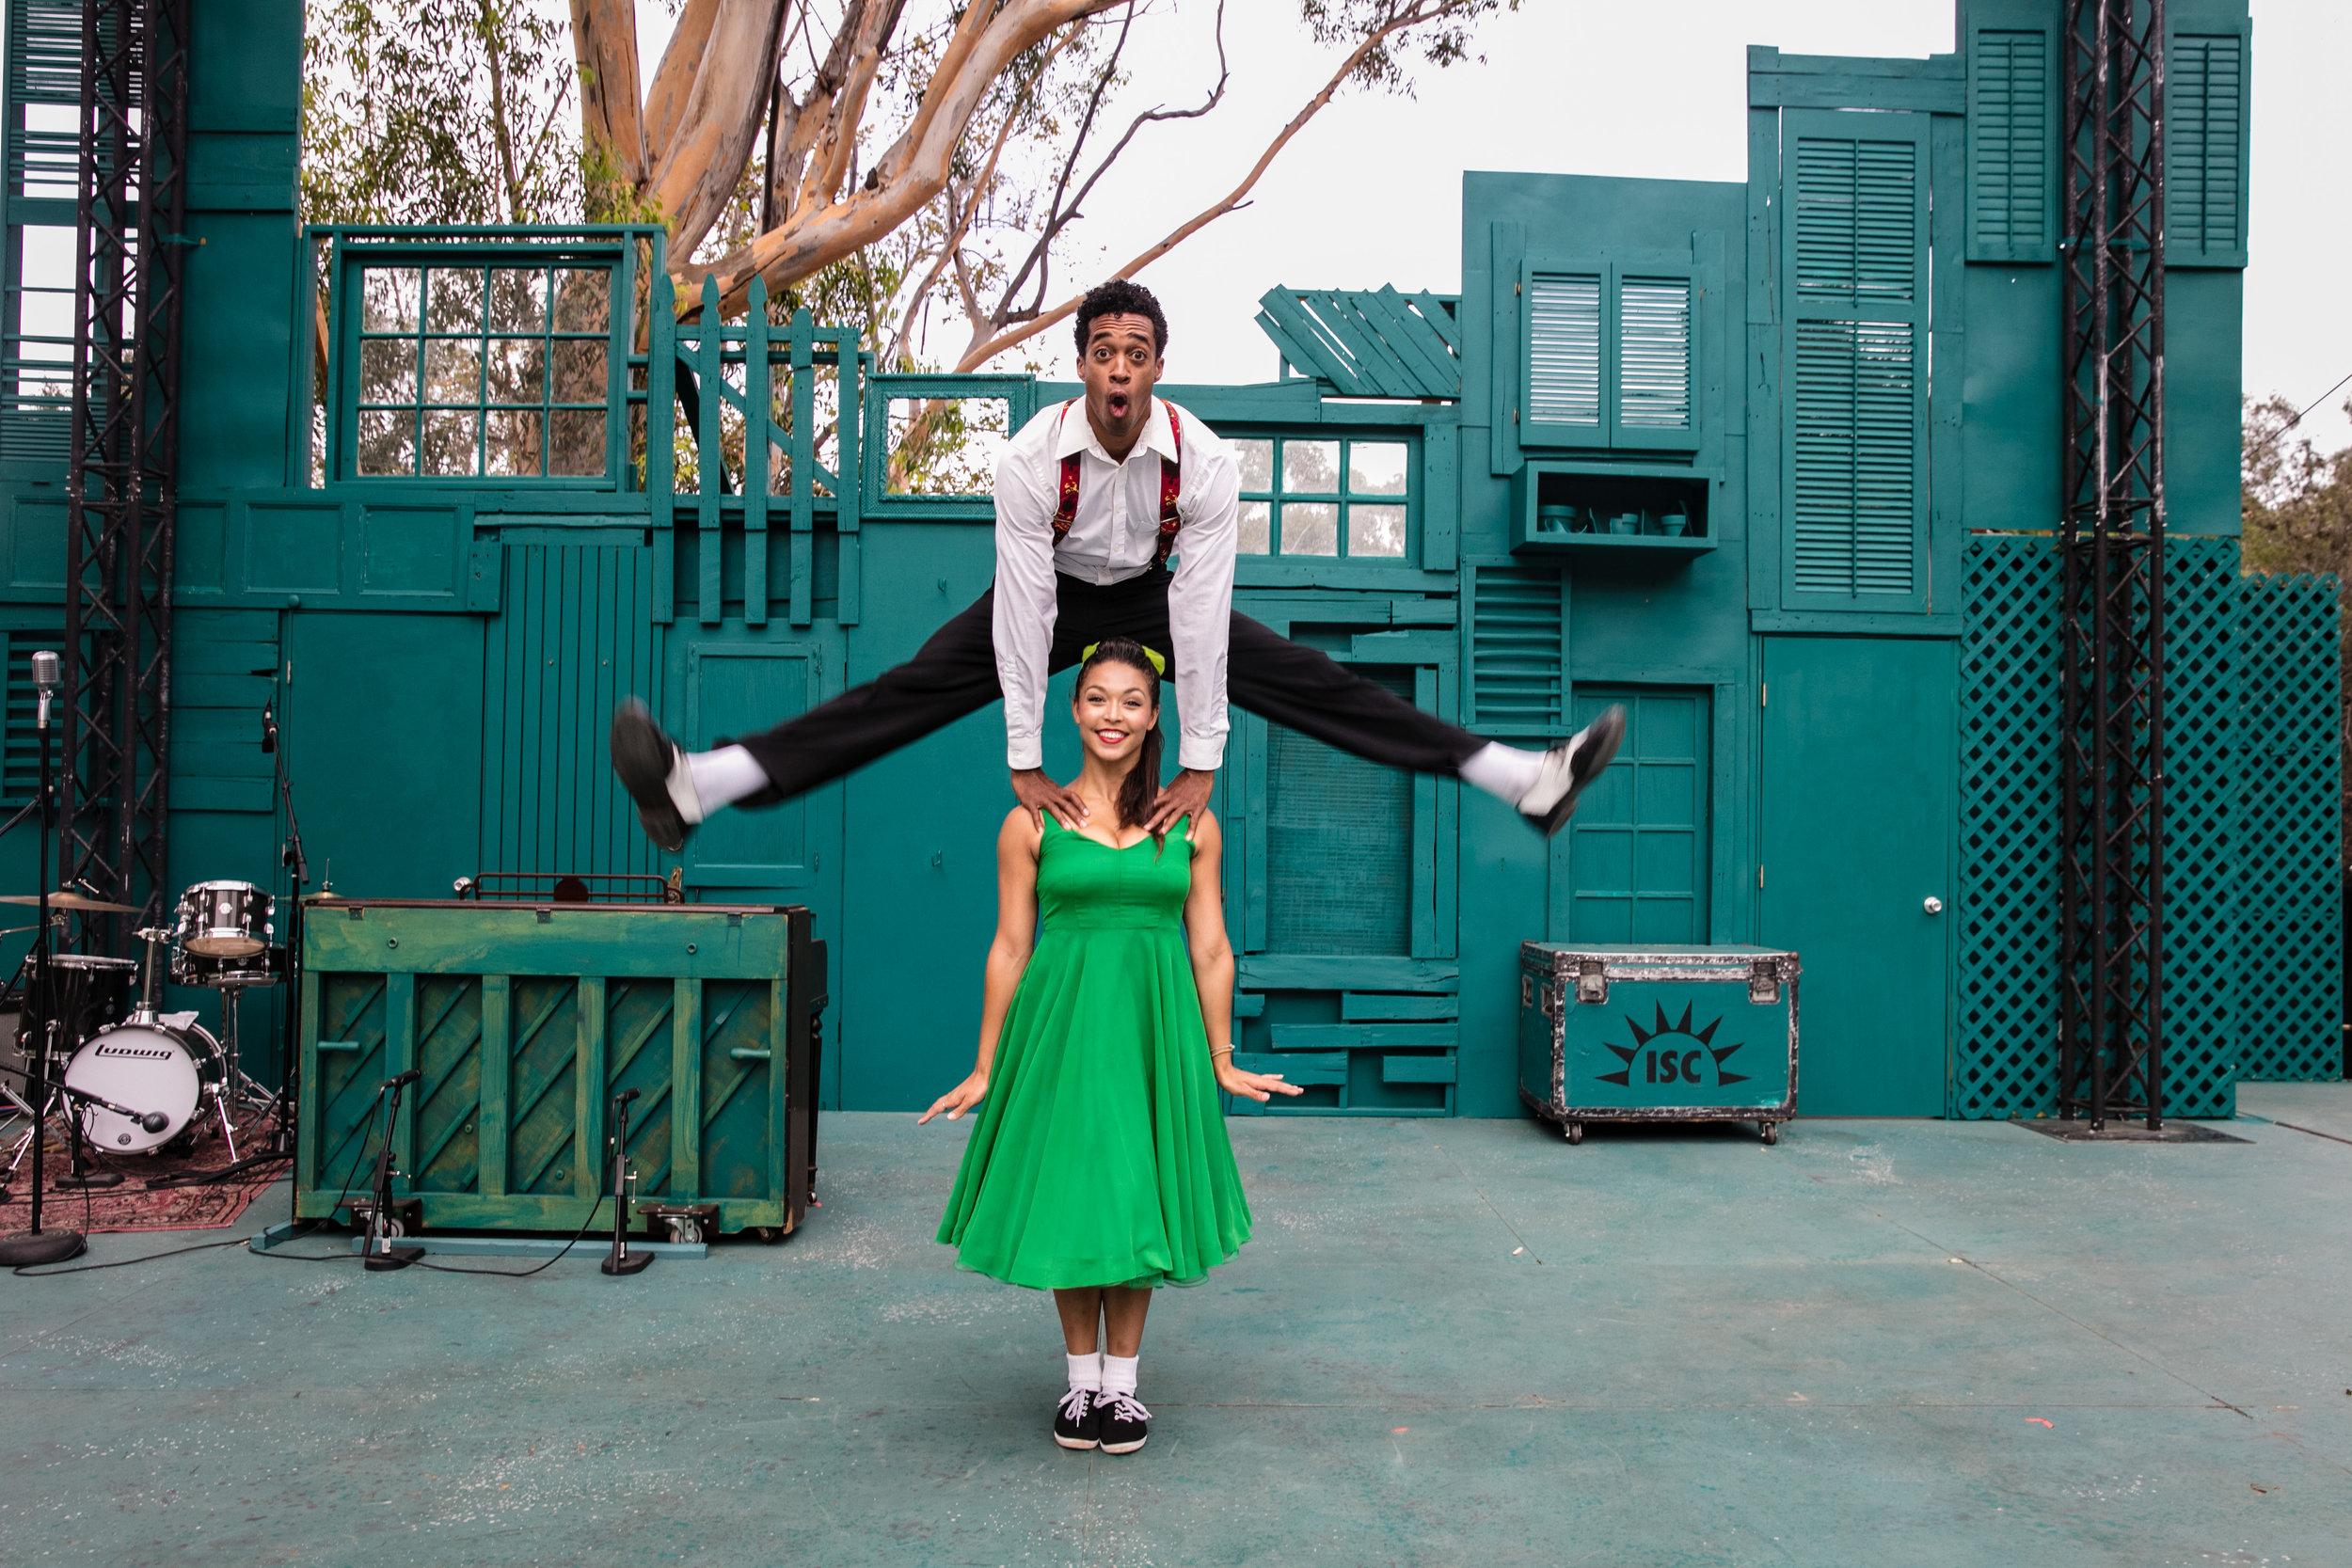 Patrick Batiste and Katie Powers-Faulk. Photo: Grettel Cortes